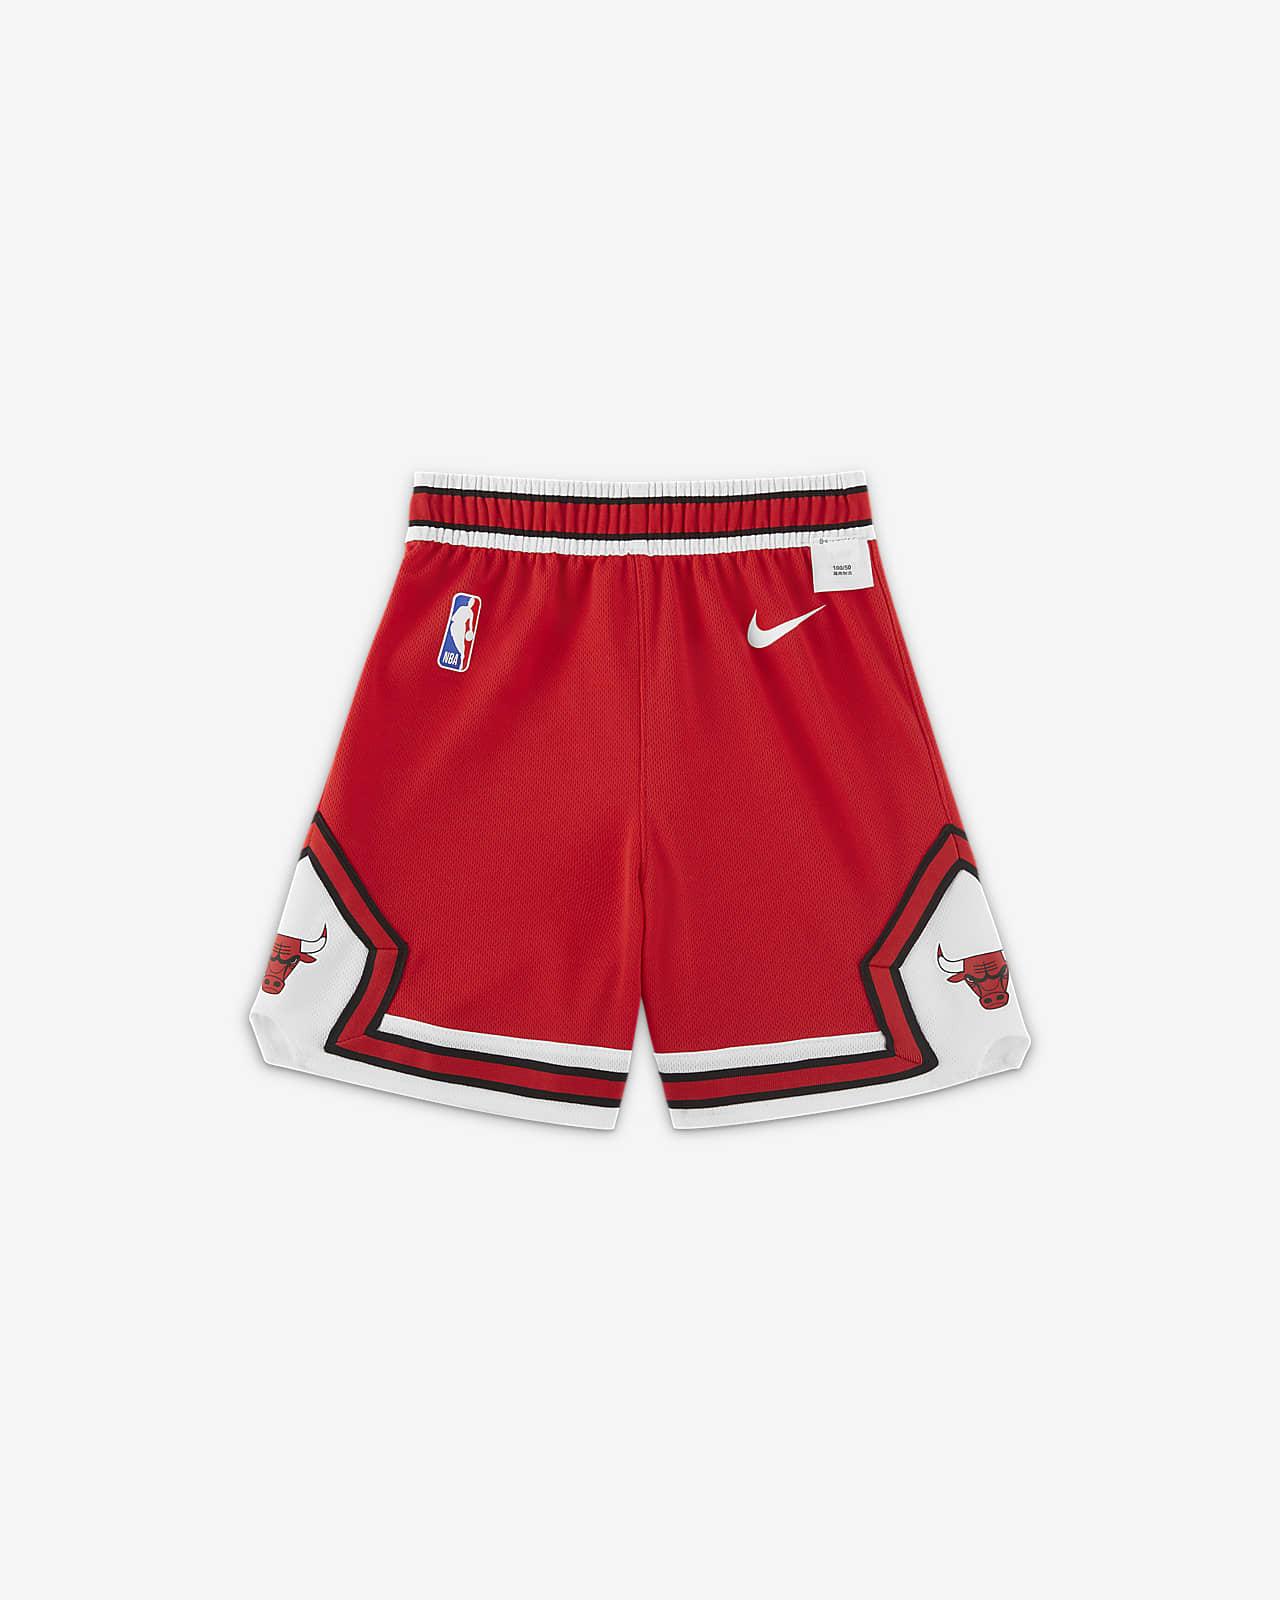 芝加哥公牛队 Icon Edition Nike NBA 婴童短裤